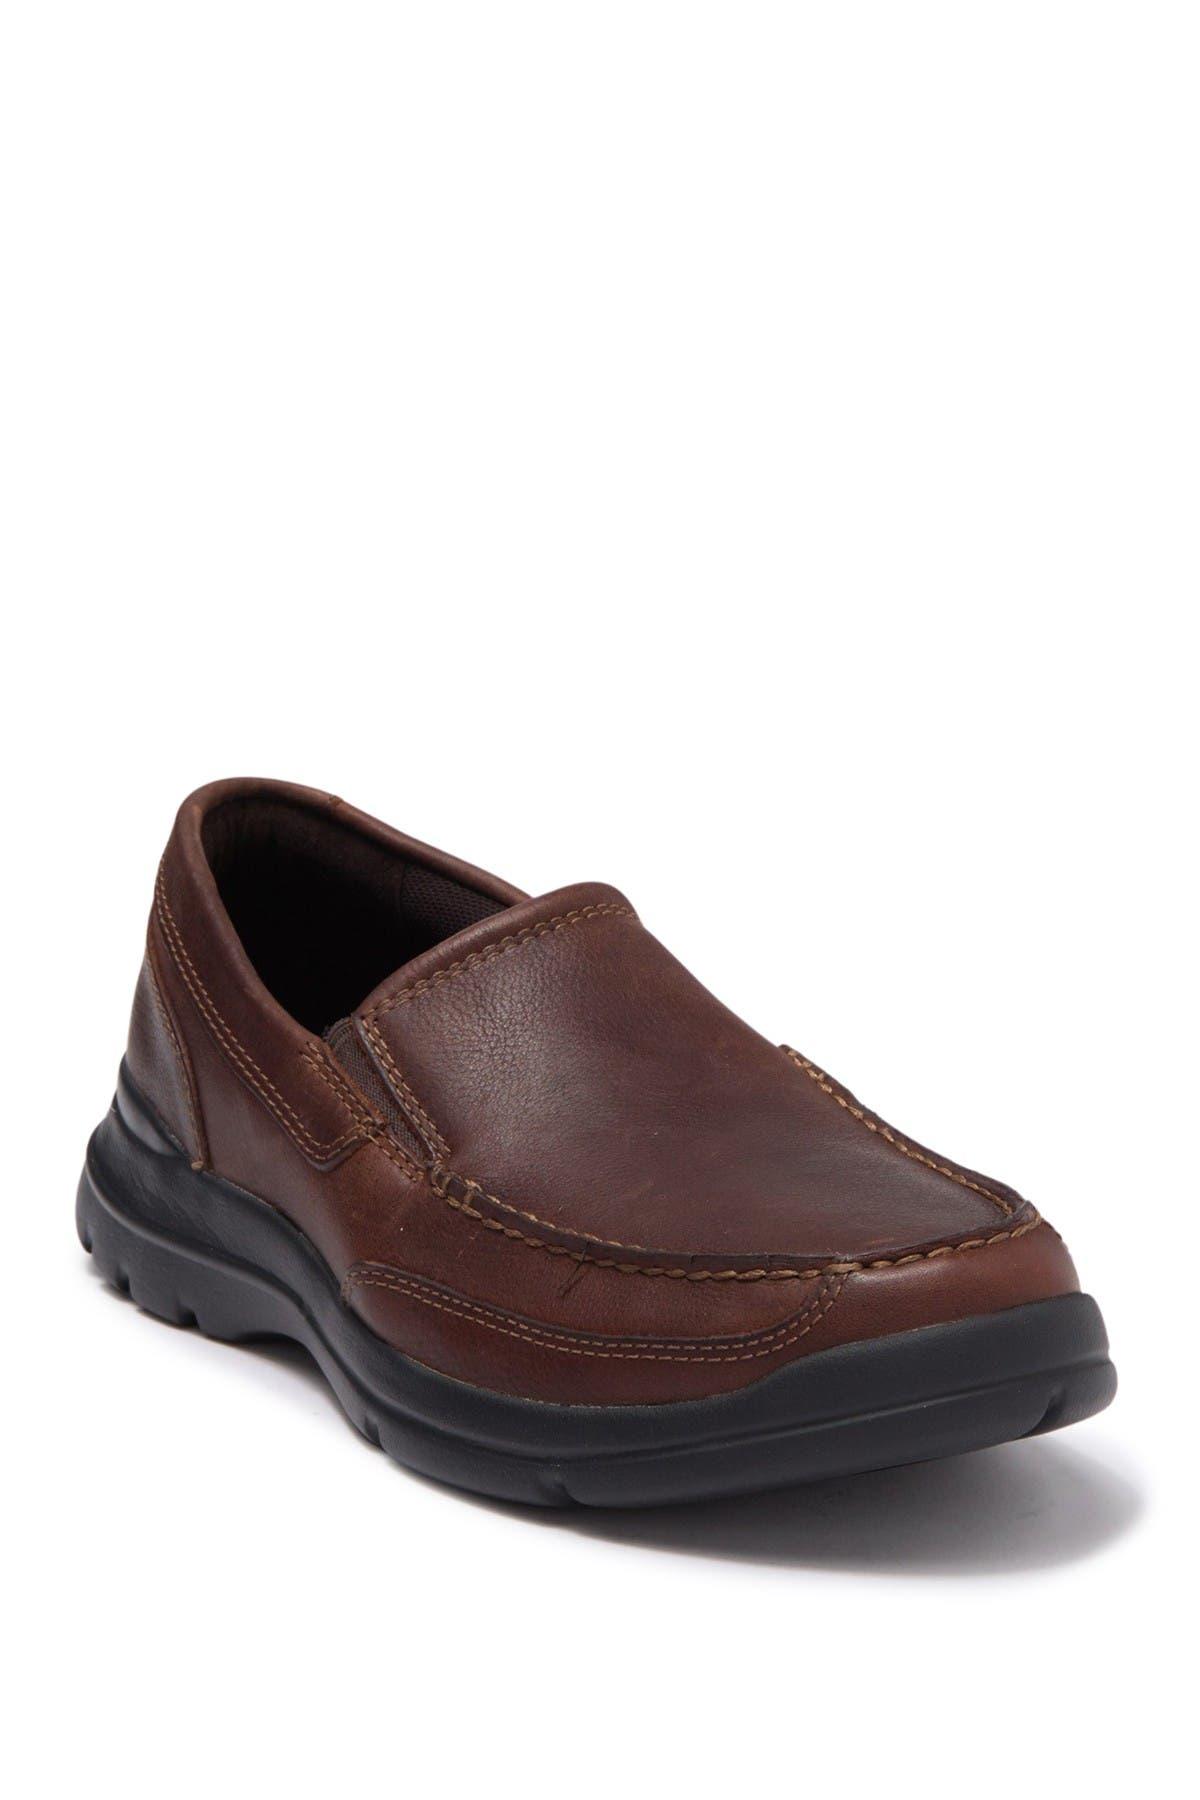 Image of Rockport Junction Slip-On Sneaker